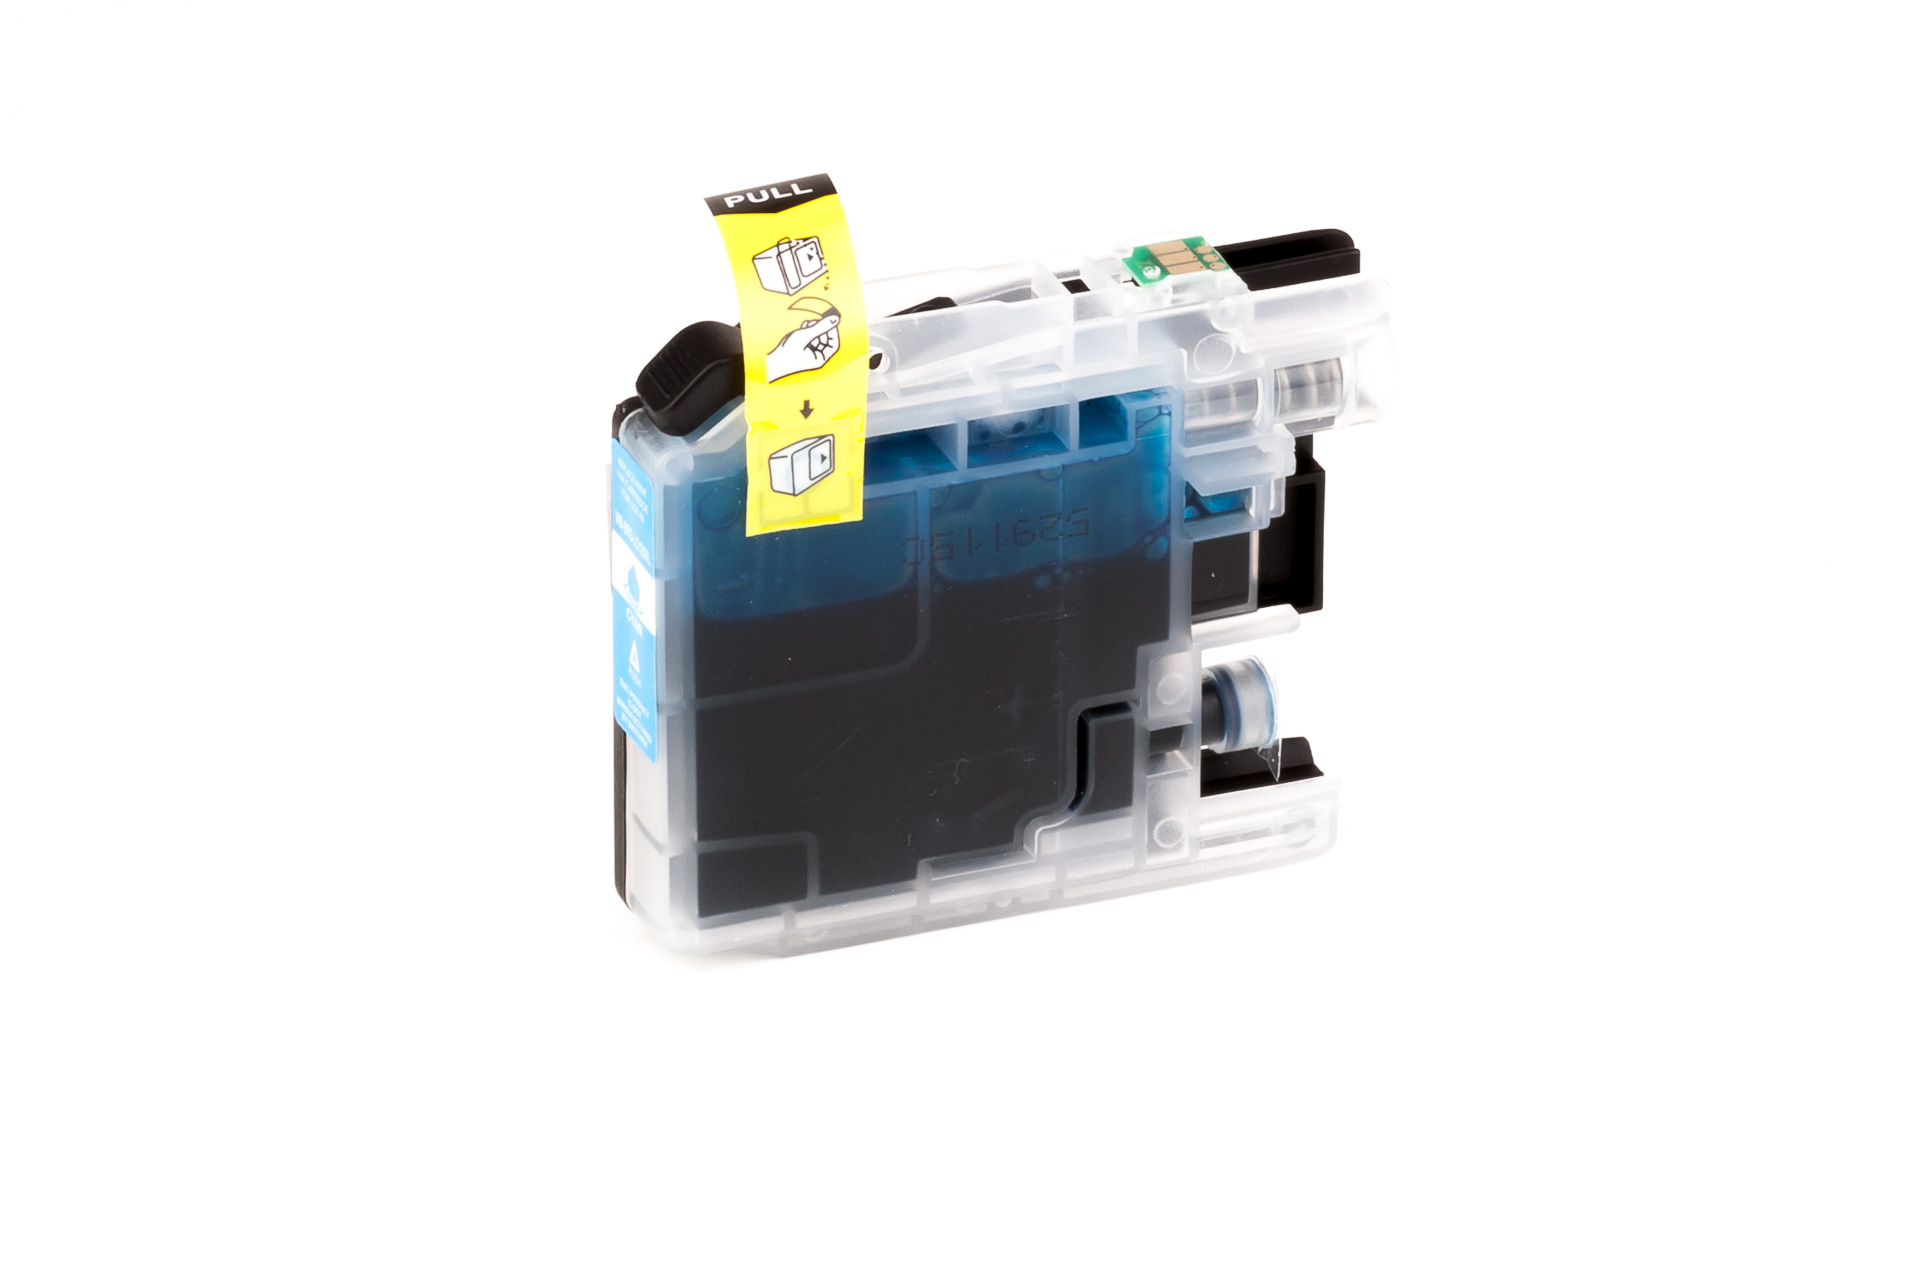 ASC-Premium-Tintenpatrone für Brother MFC-J 4410 DW cyan MFC-J 4410 DW MFC-J4410DW